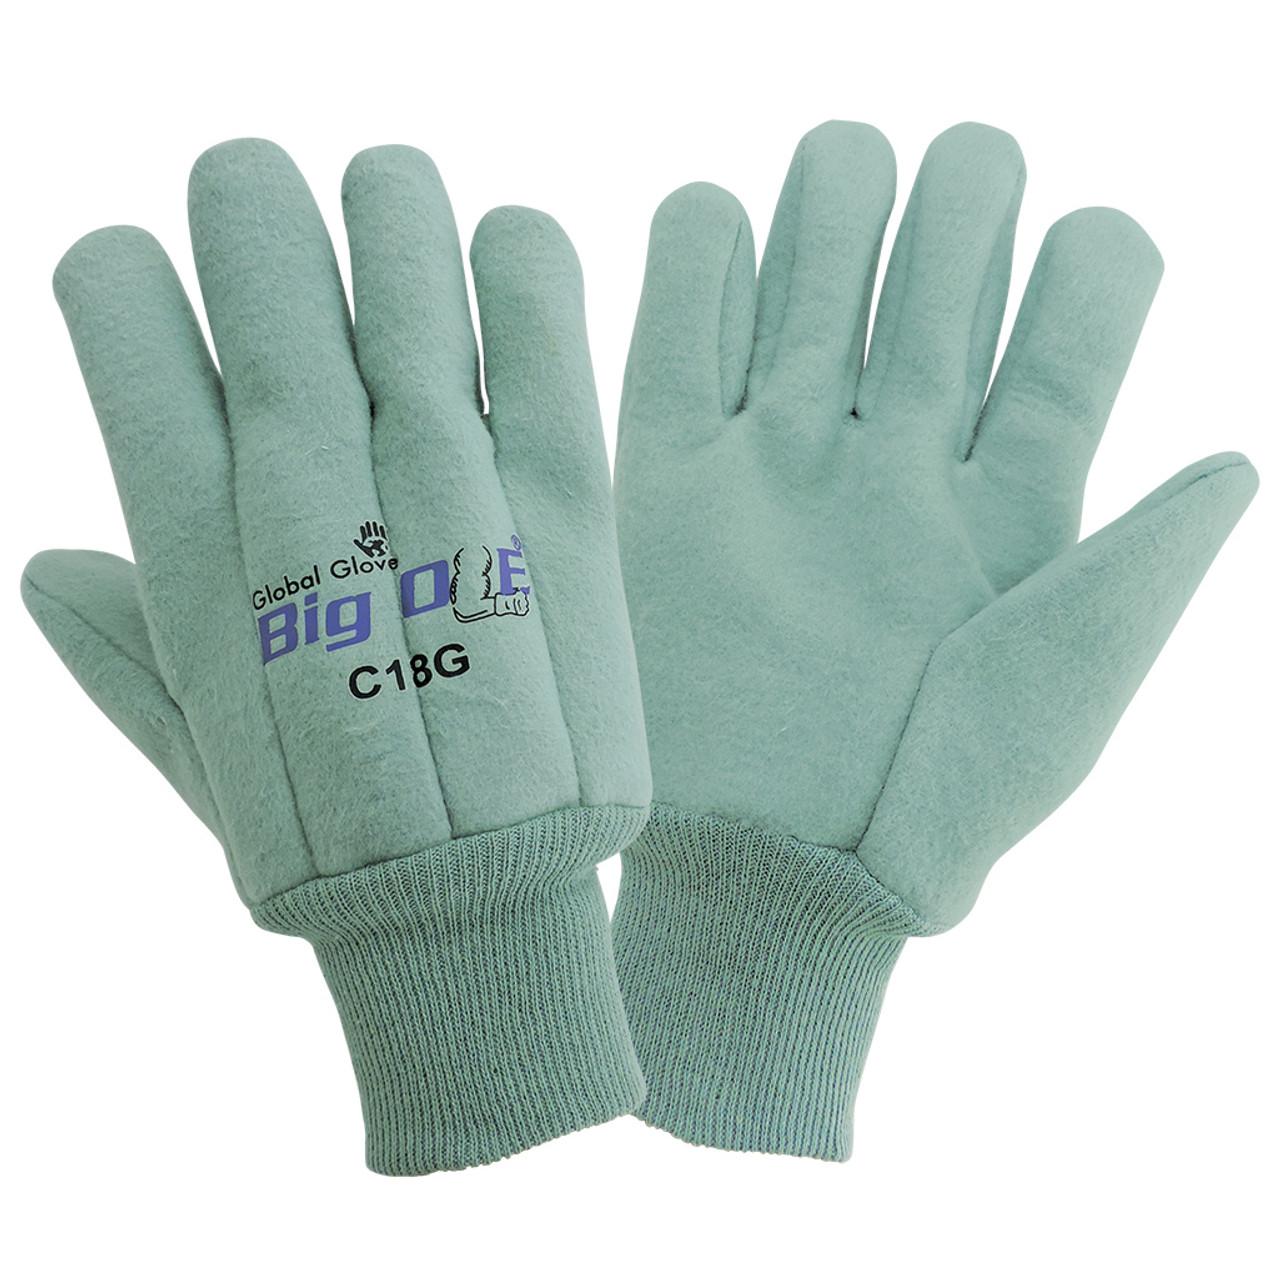 Global Glove C18G Premium 18-Ounce Heavyweight Cotton Chore Gloves